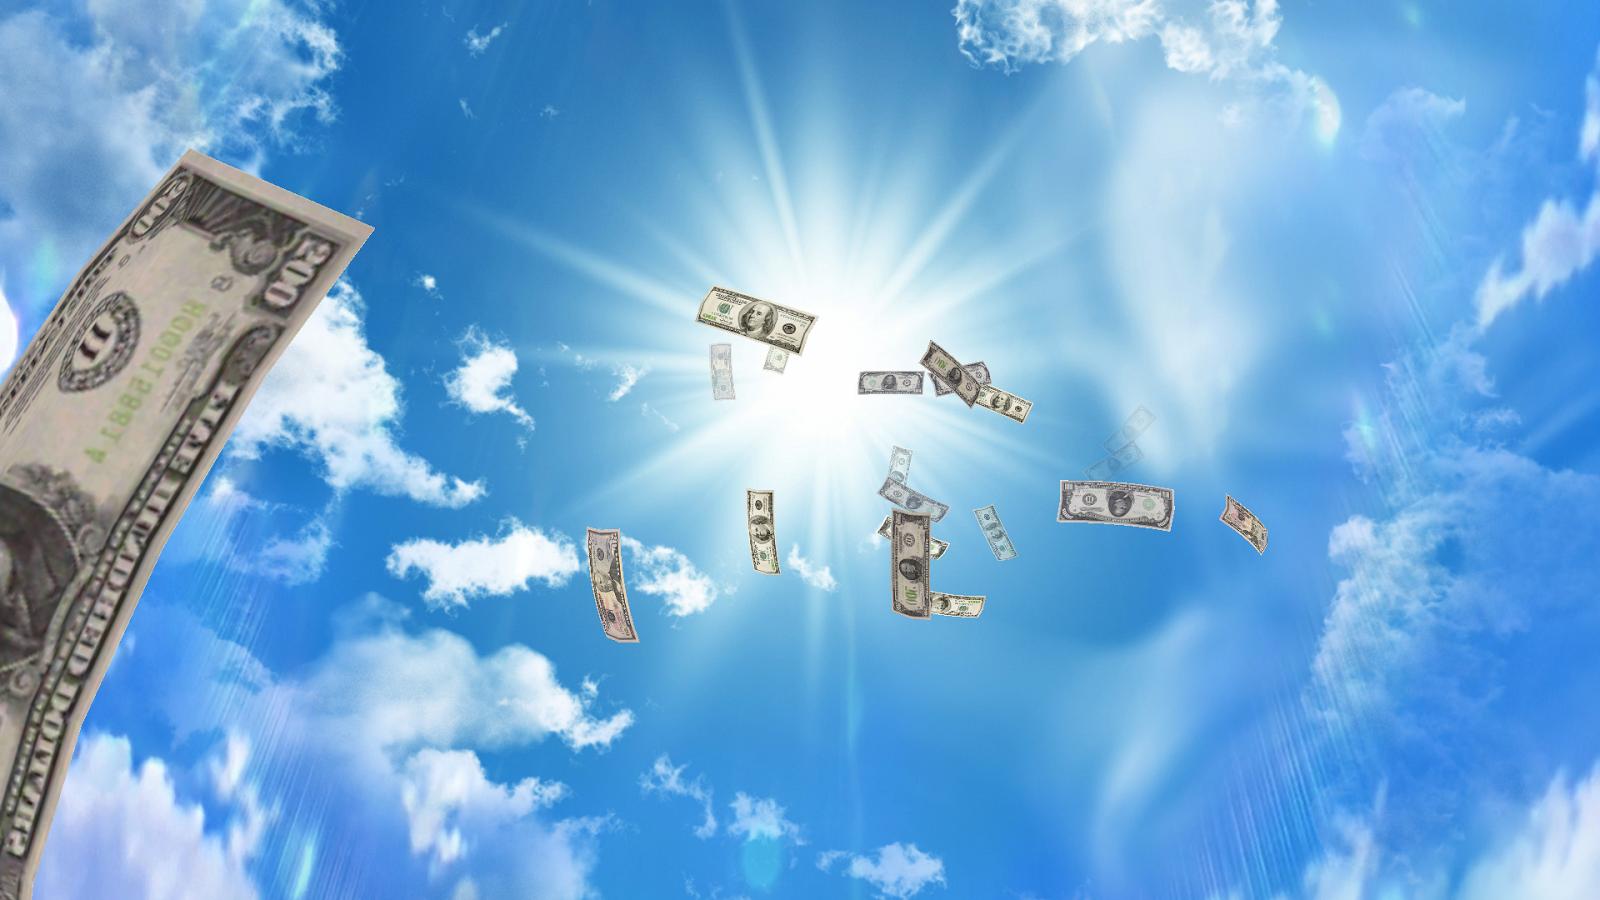 Falling Money Live Wallpaper Apk Pro Apk Com Pro Apk One